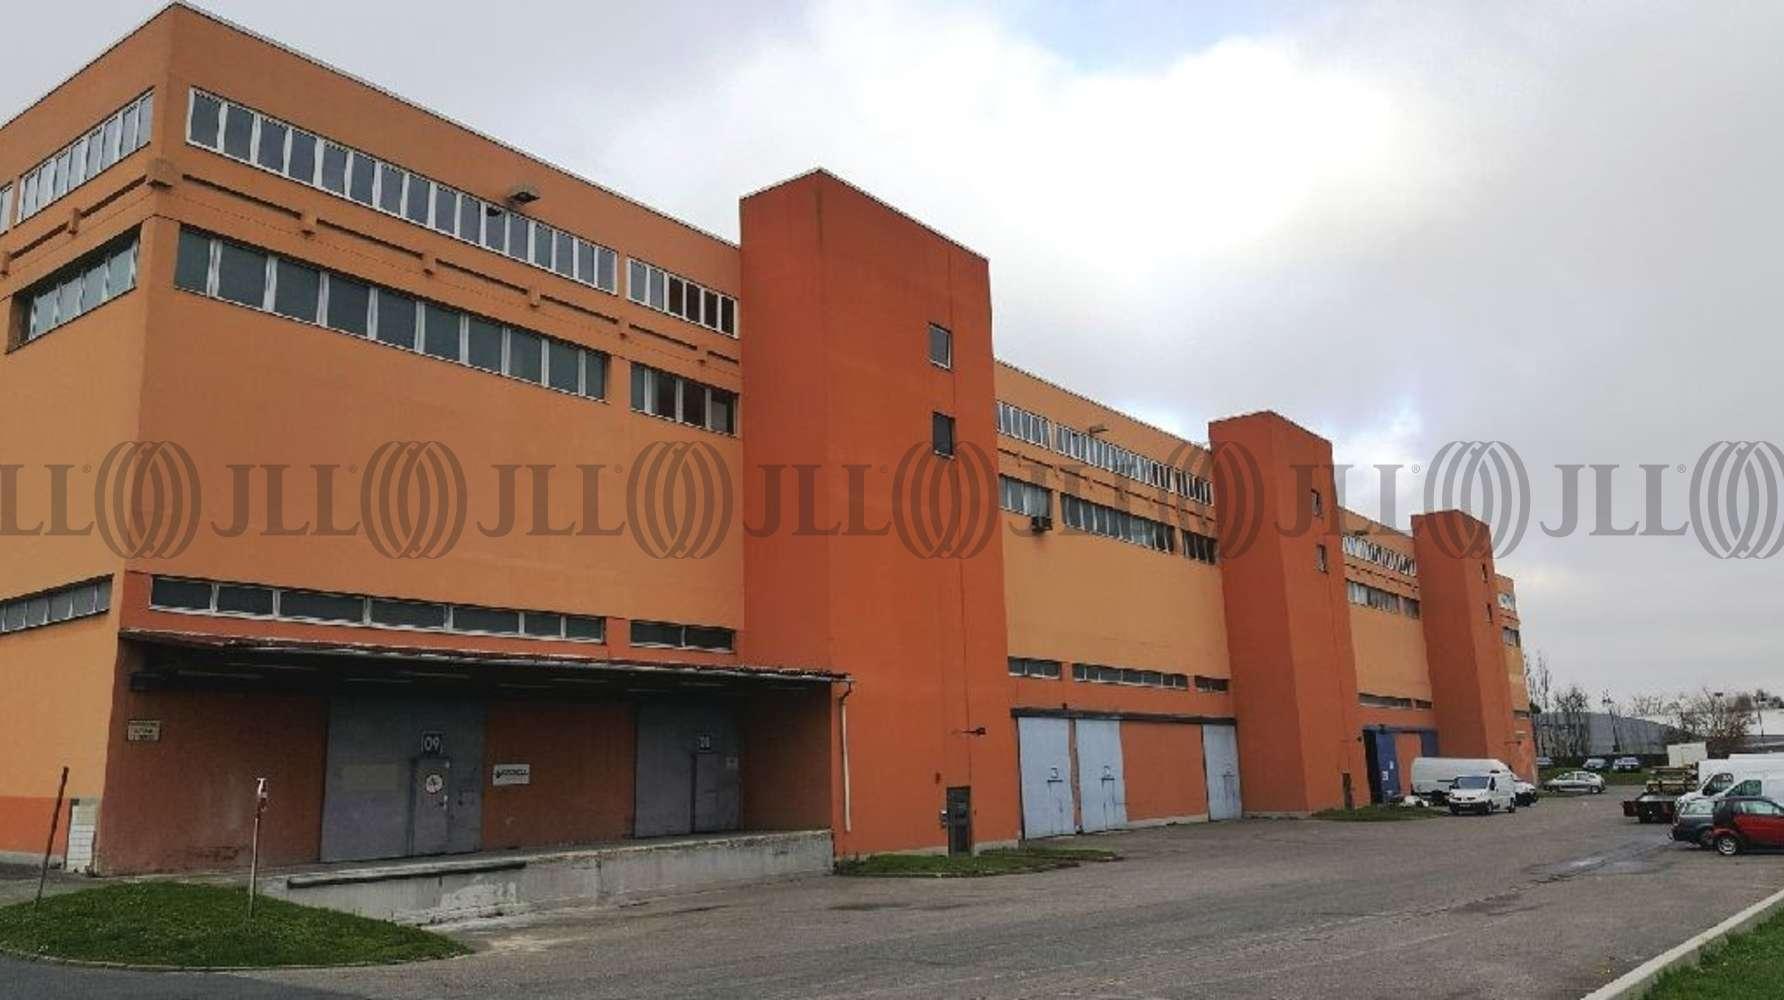 Activités/entrepôt Antony, 92160 - 34 AVENUE LEON JOUHAUX - 9458559